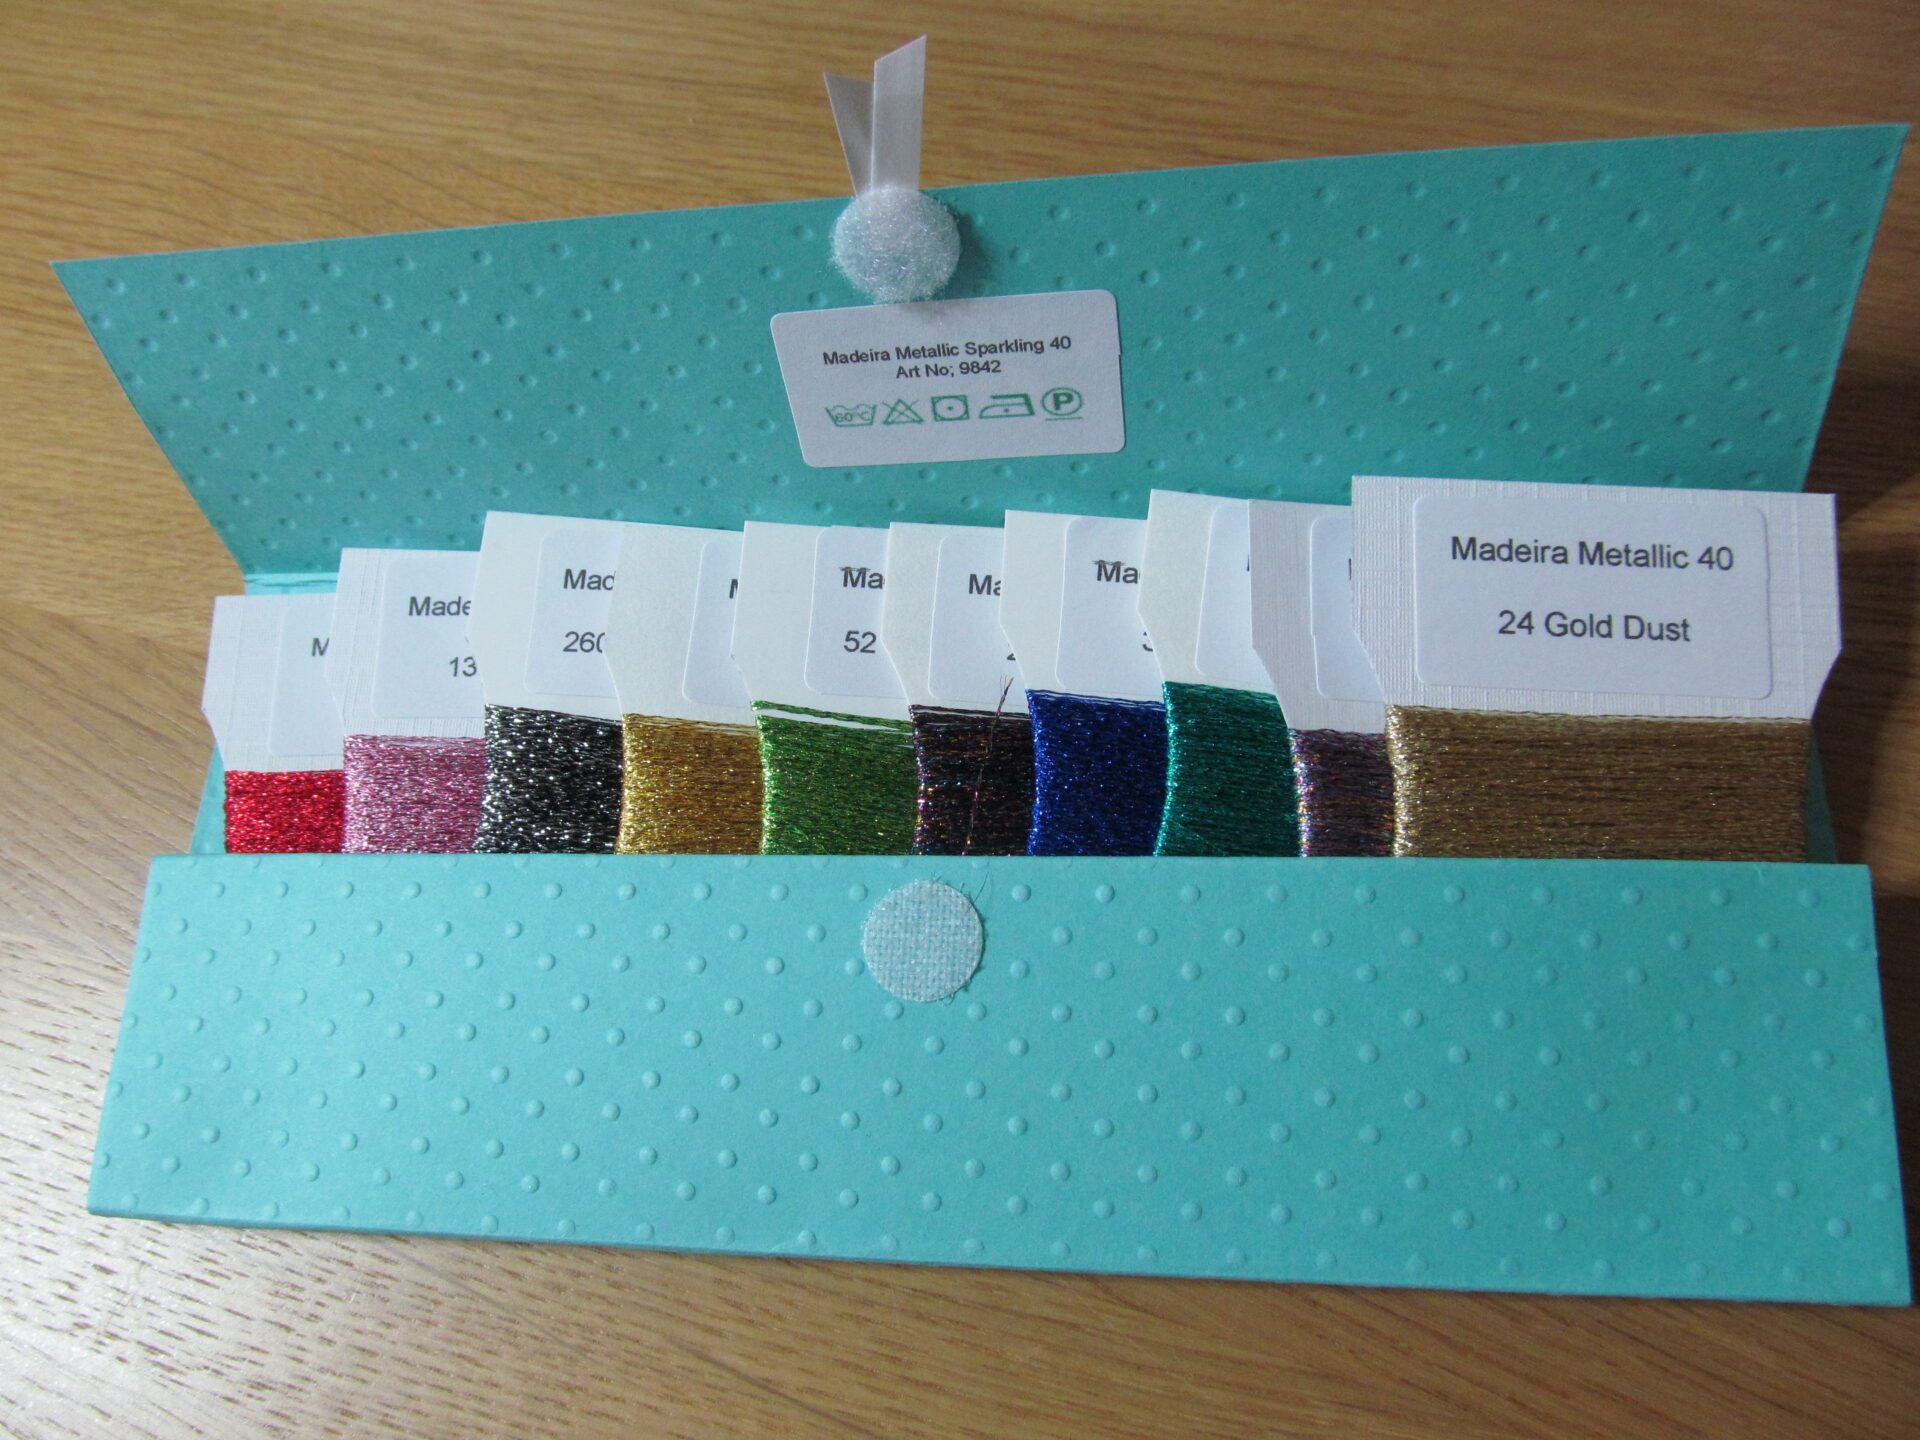 Madeira Sparkling Metallics Pack 1